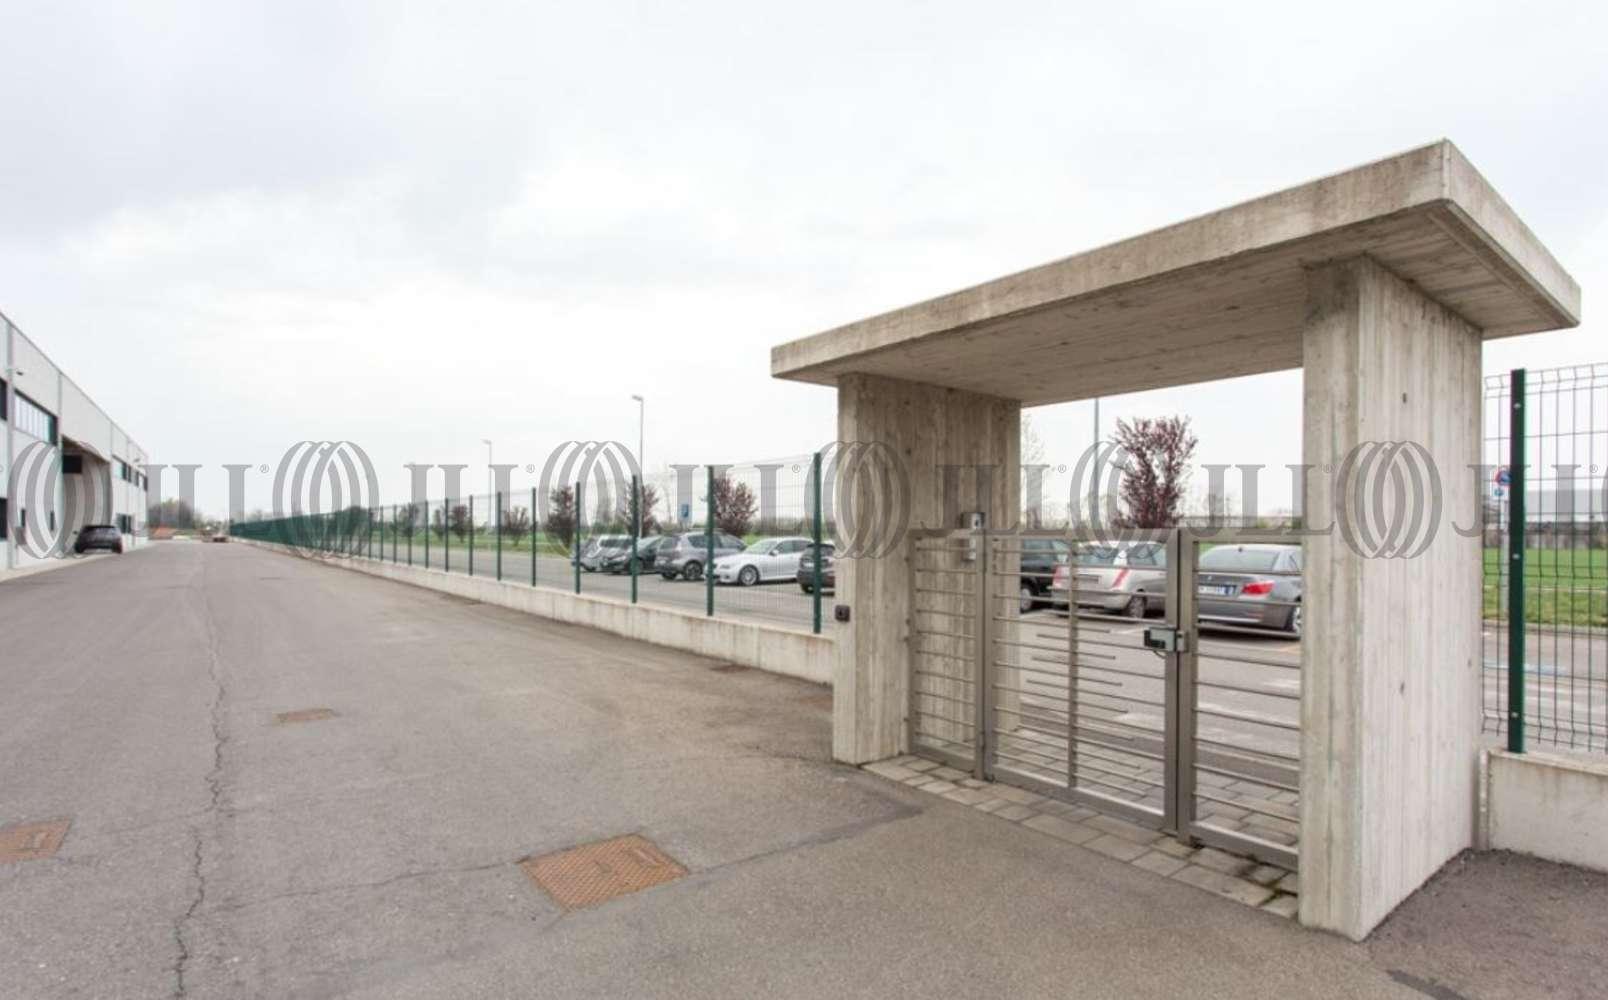 Magazzini industriali e logistici Piacenza, 29122 - Piacenza - Casoni